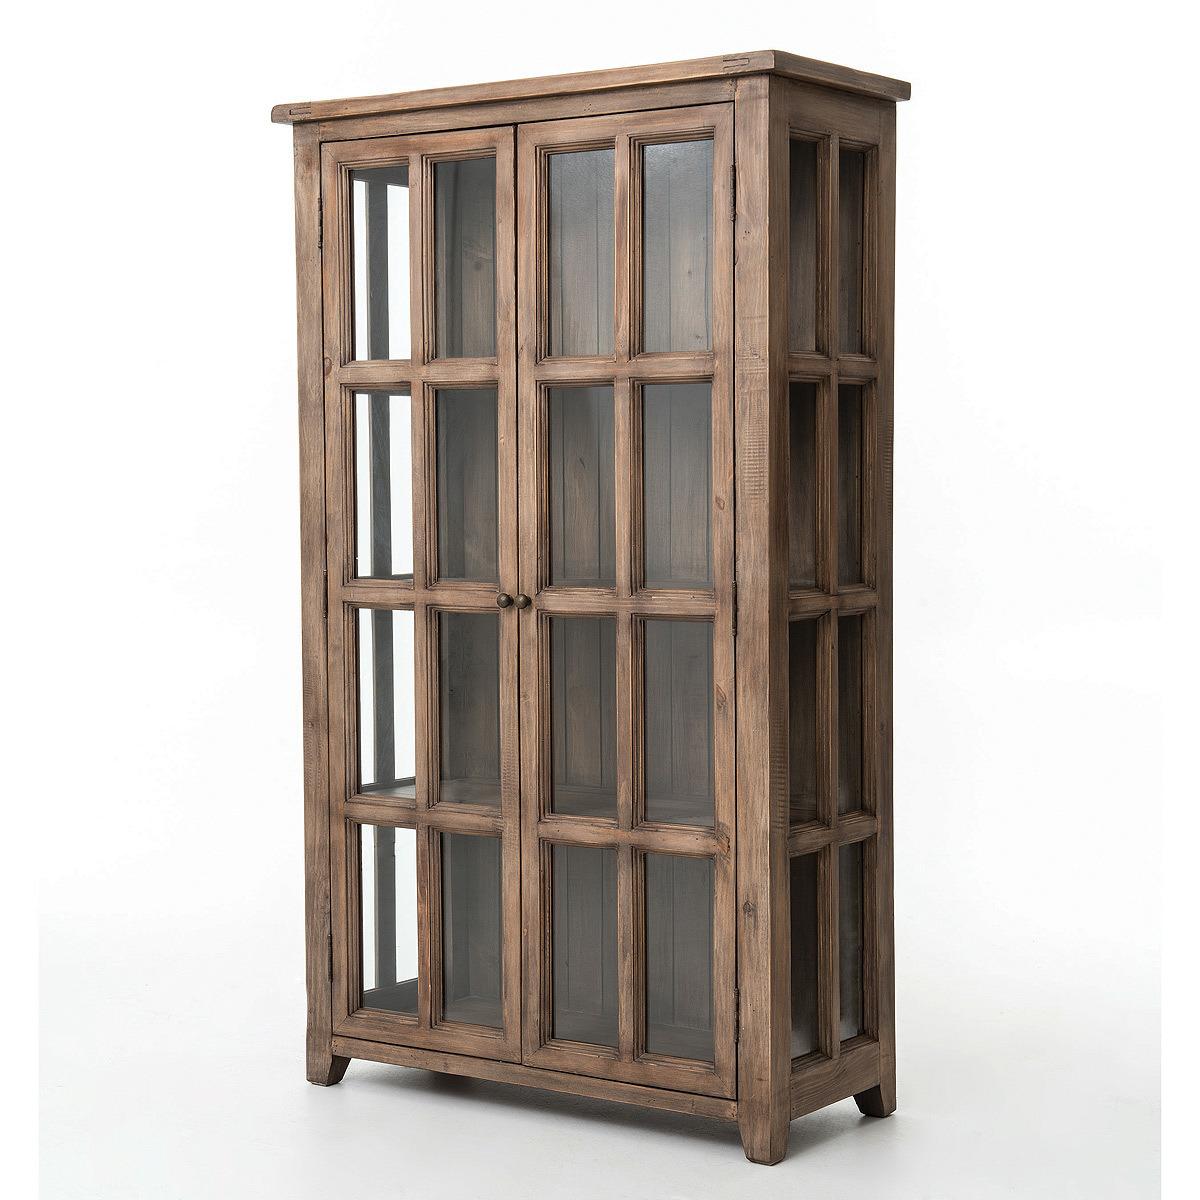 Hot Item Kvj Ca10 Storage Rustic Reclaimed Wood Bookcase Cabinet With Glass Door